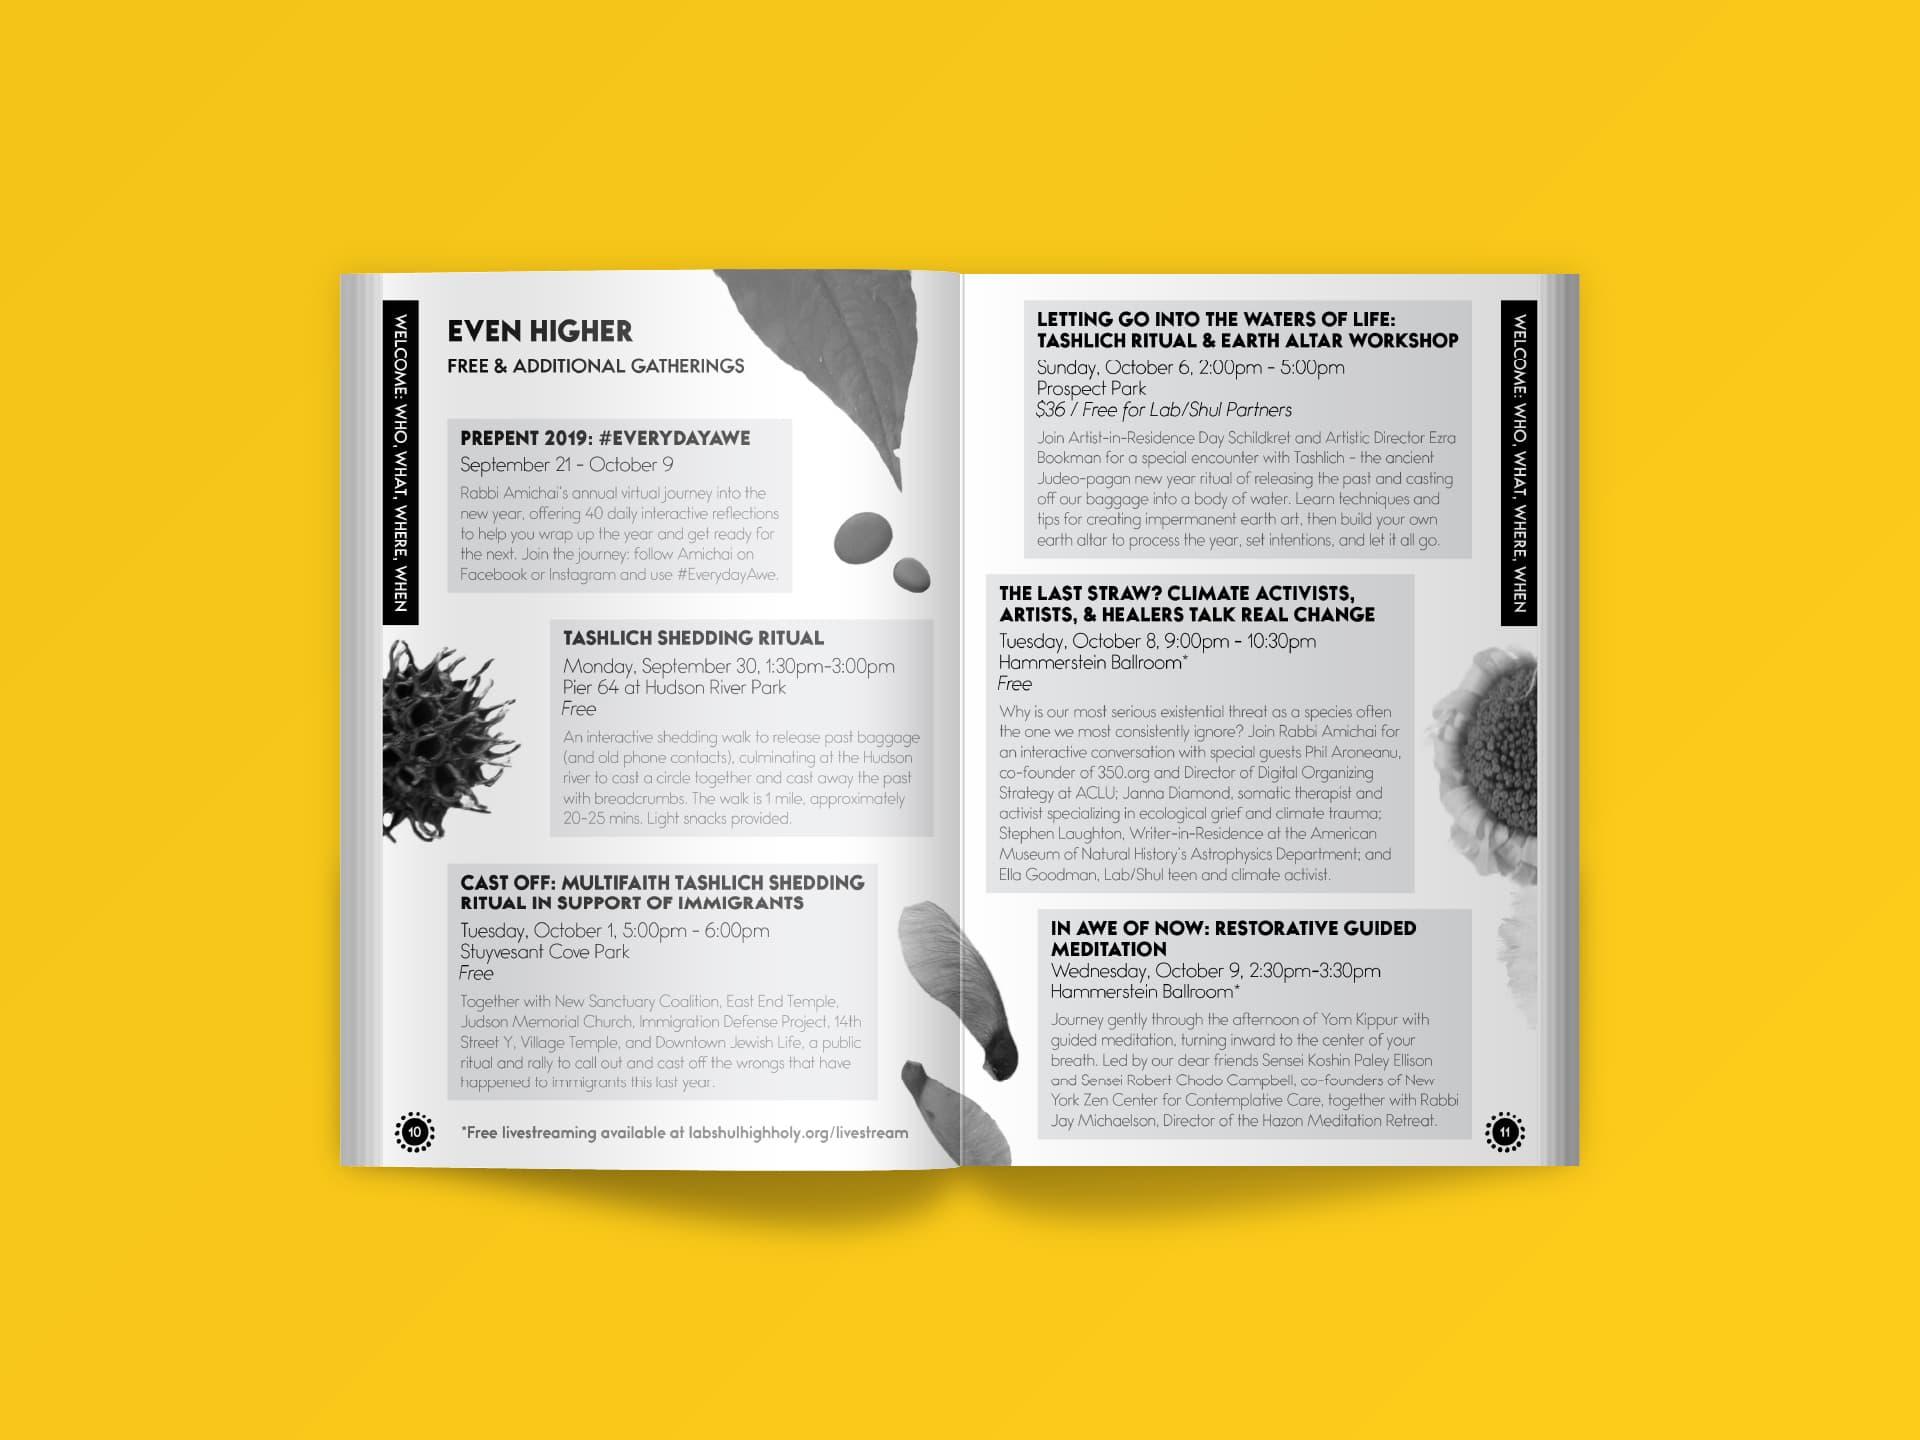 Program (Pages 10-11)